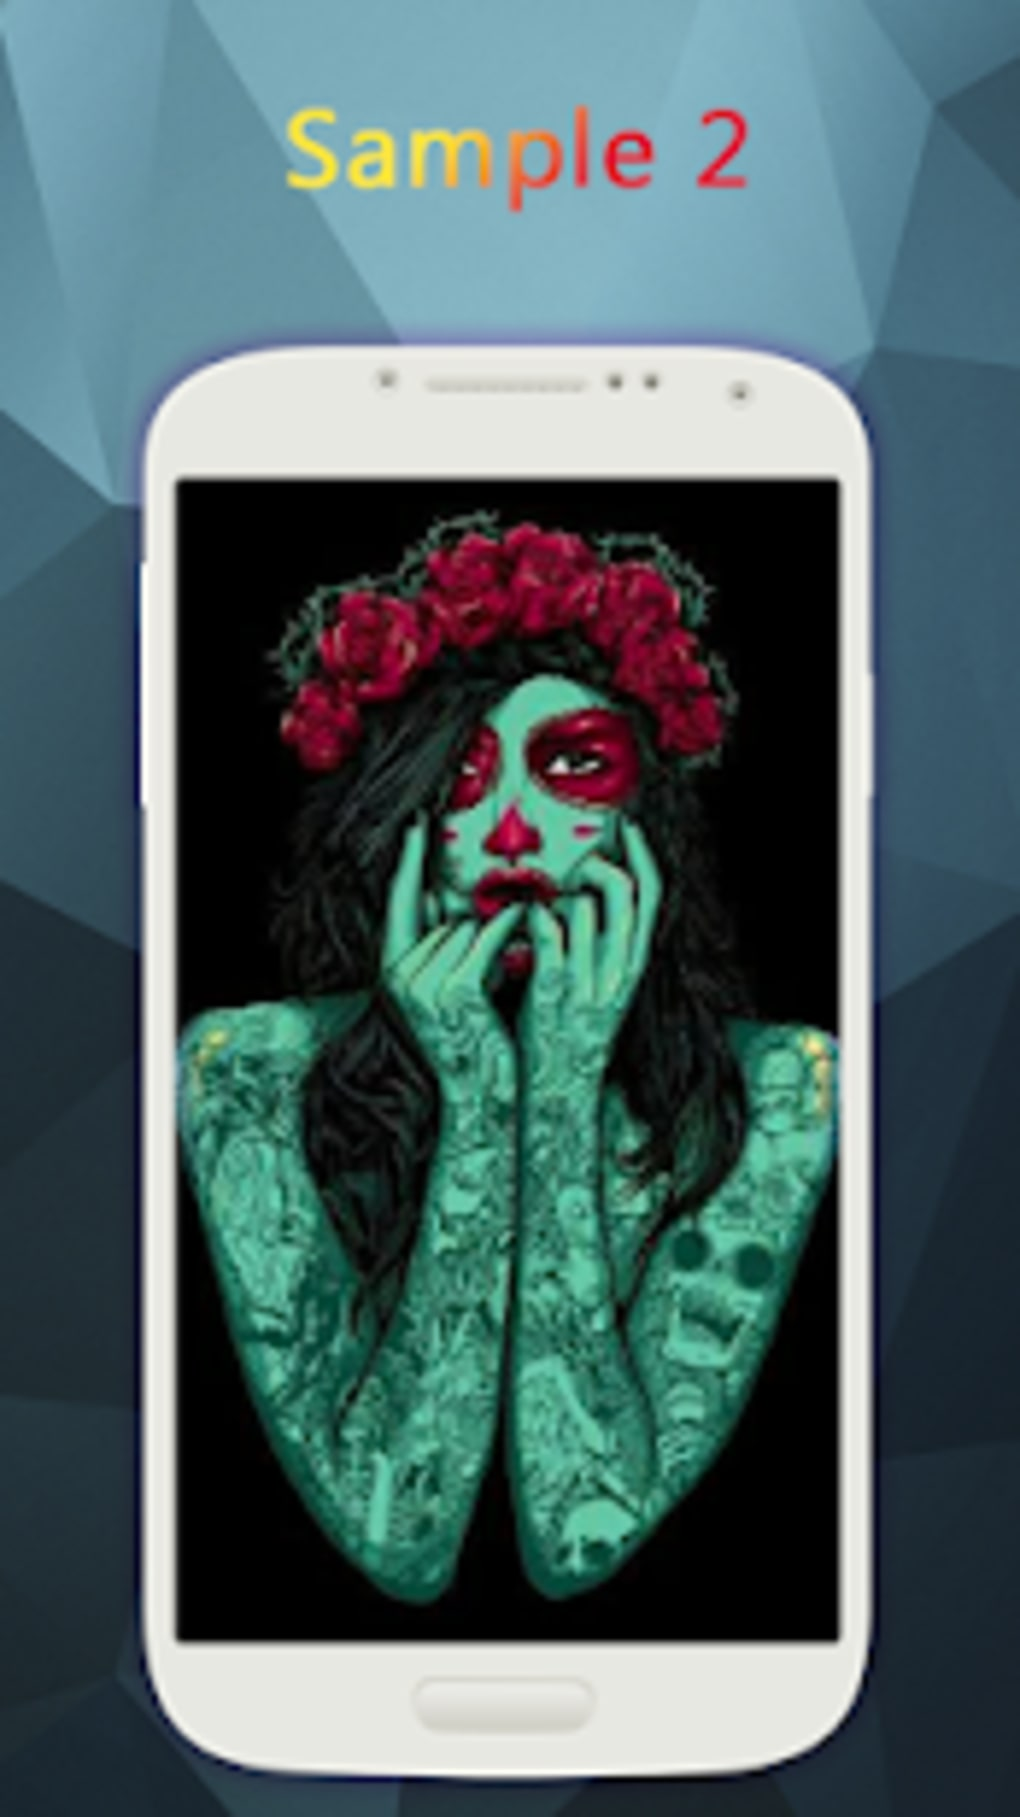 Sugar Skull Wallpaper Apk For Android Download